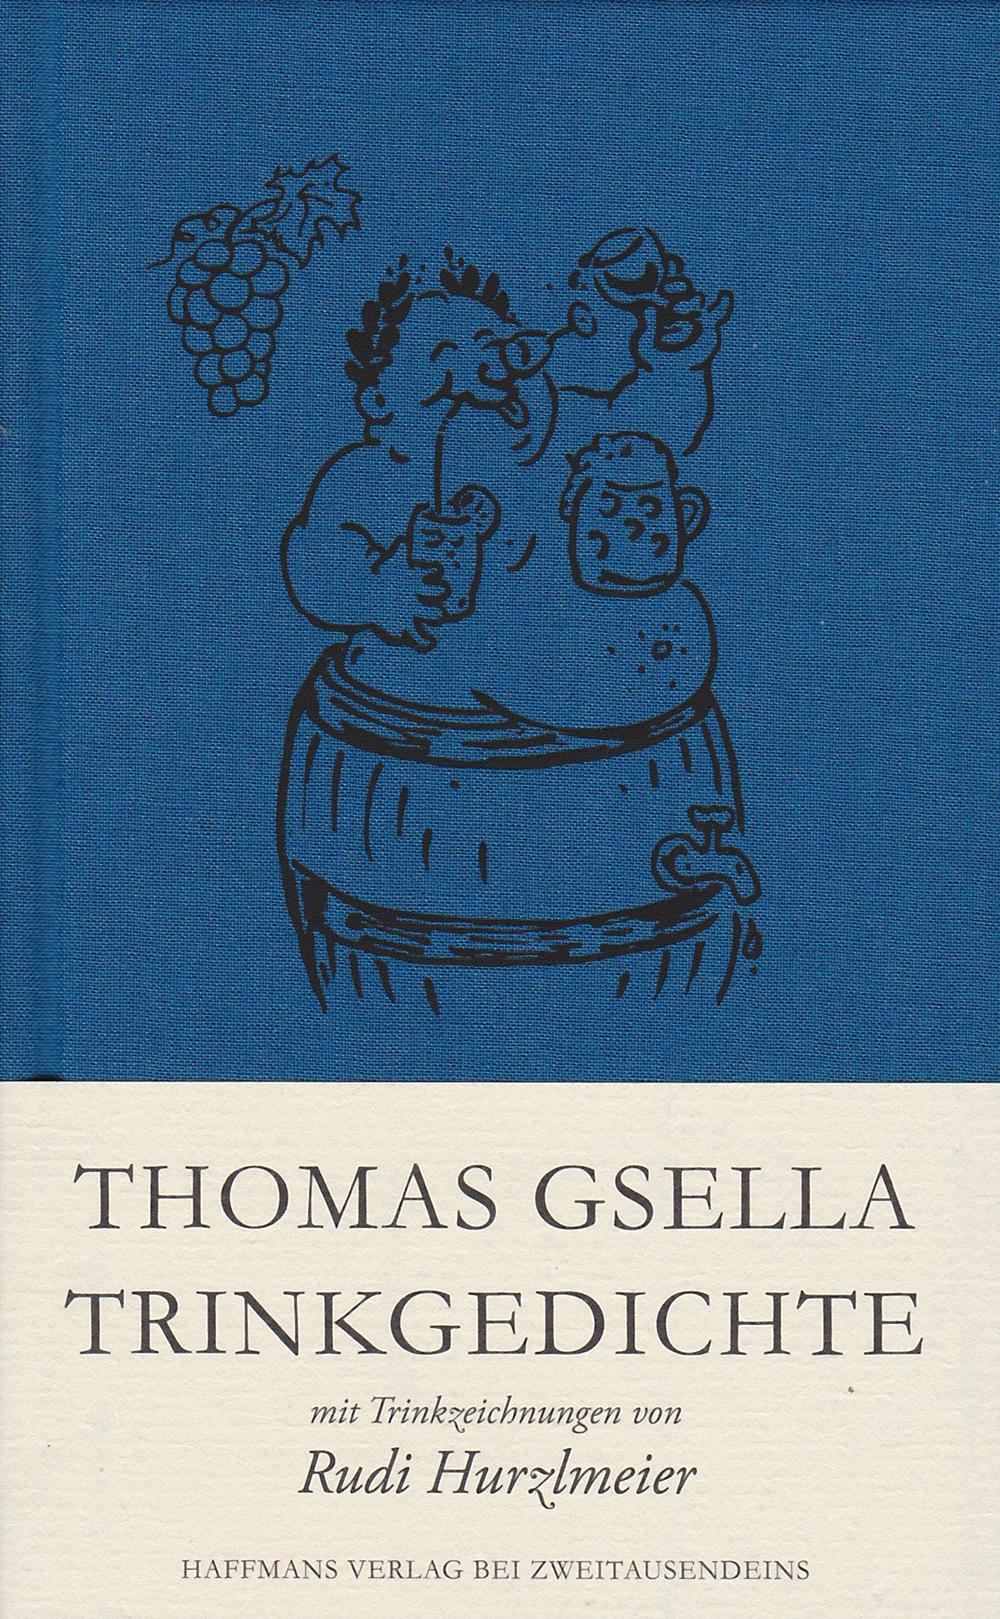 Thomas Gsella: Trinkgedichte